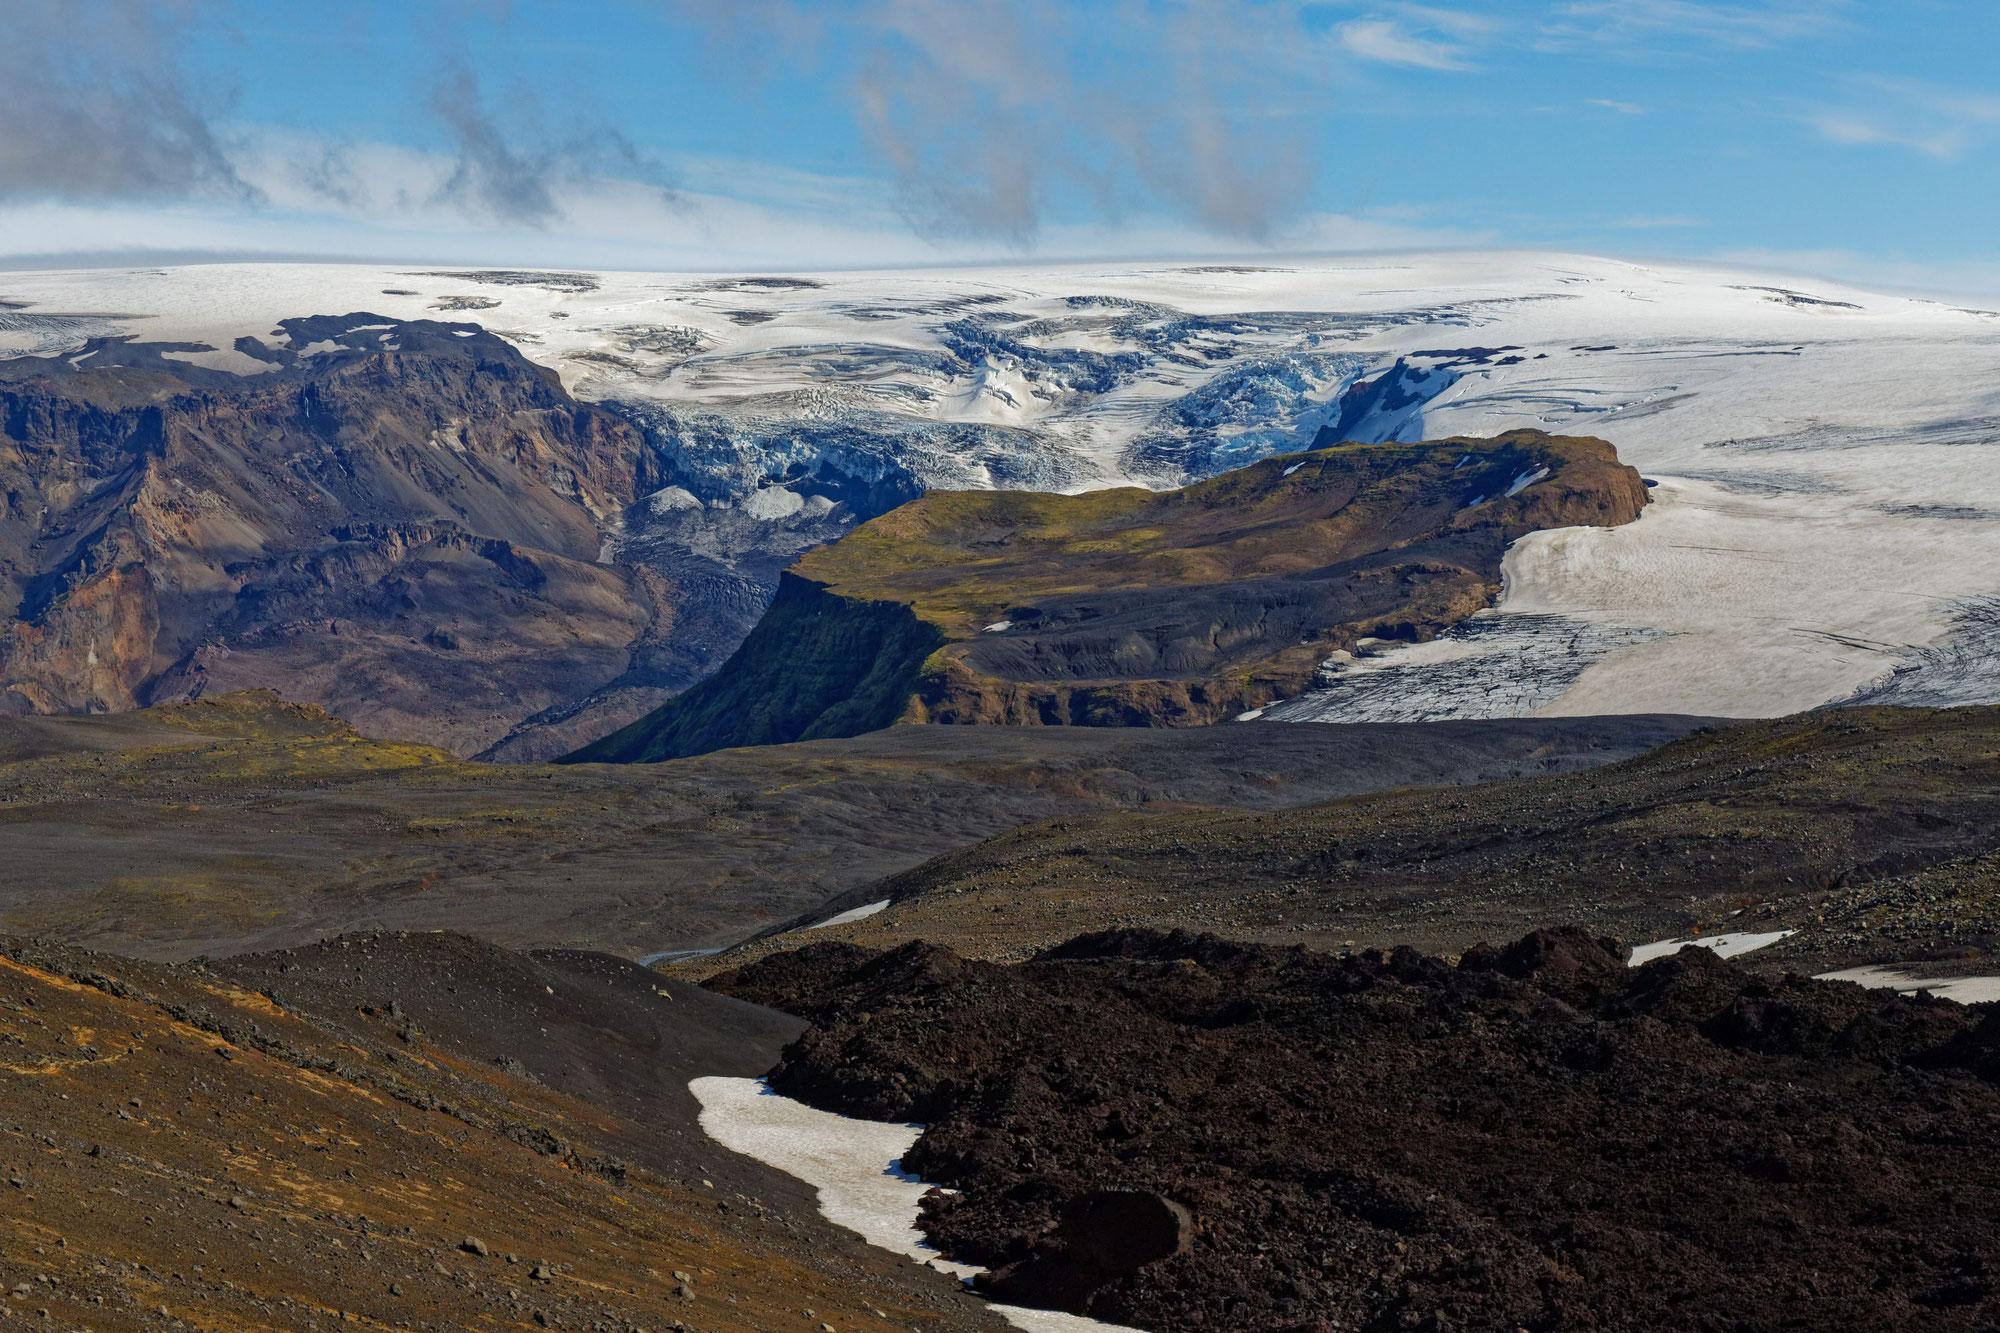 Island - Tanz auf dem Vulkan